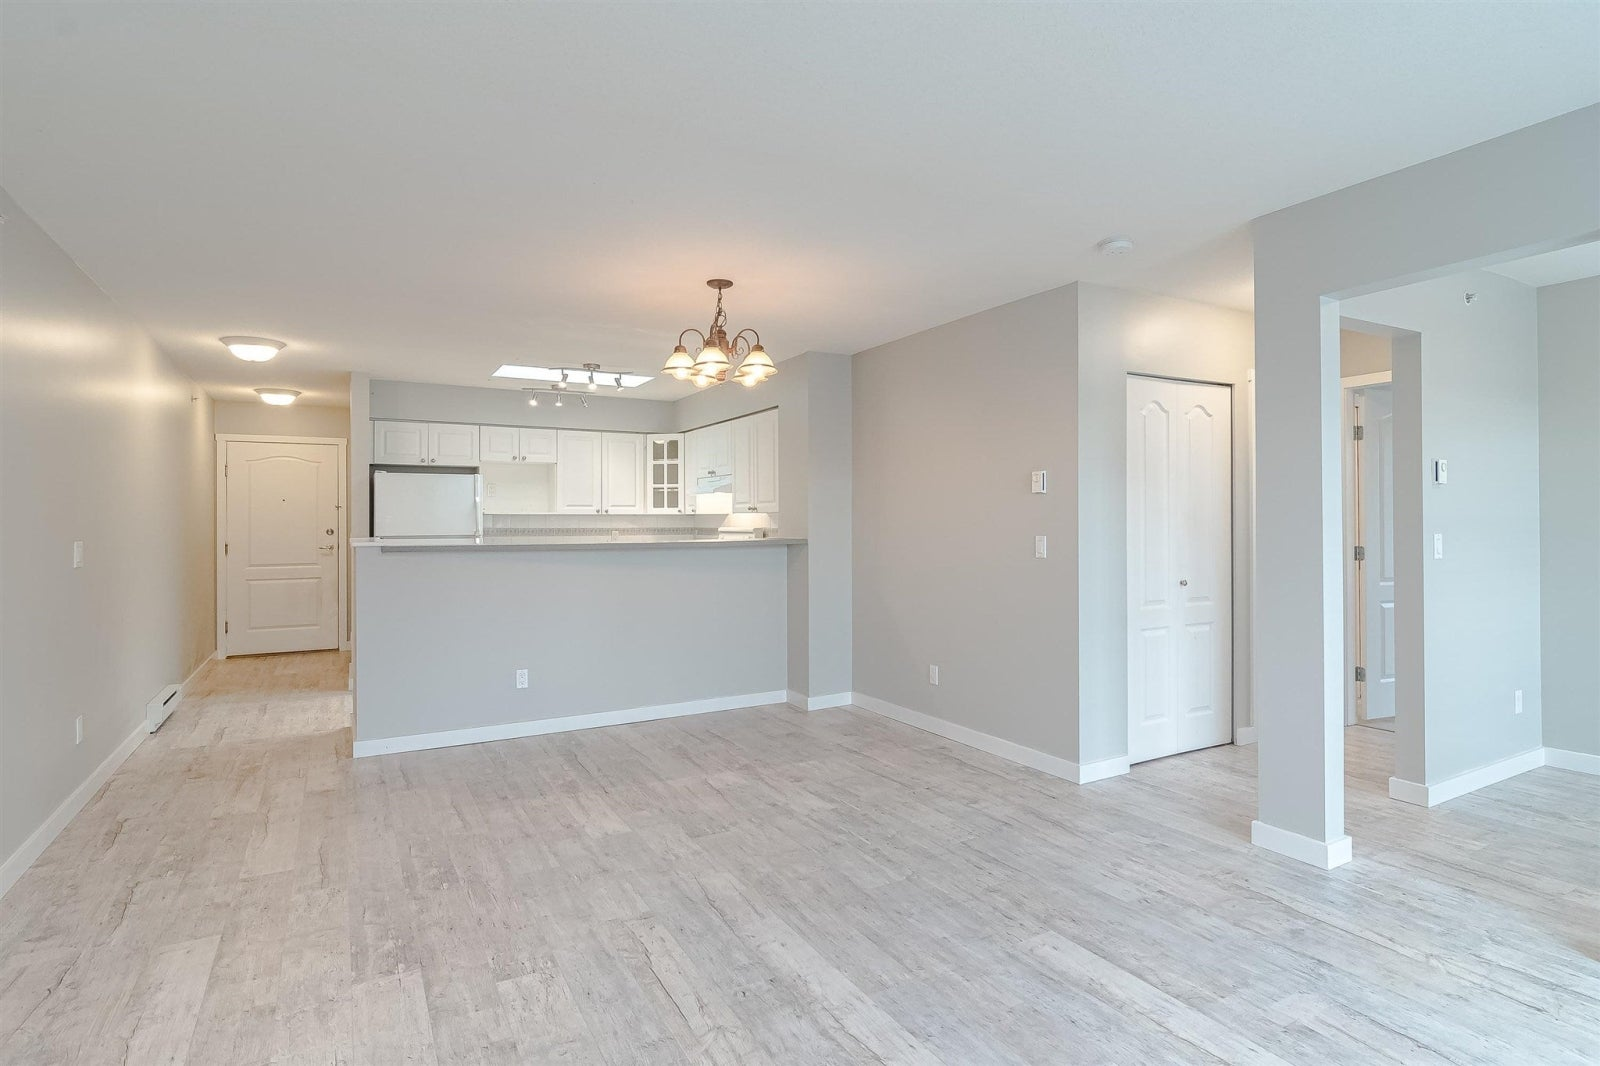 405 20268 54 AVENUE - Langley City Apartment/Condo for sale, 2 Bedrooms (R2604183) #11